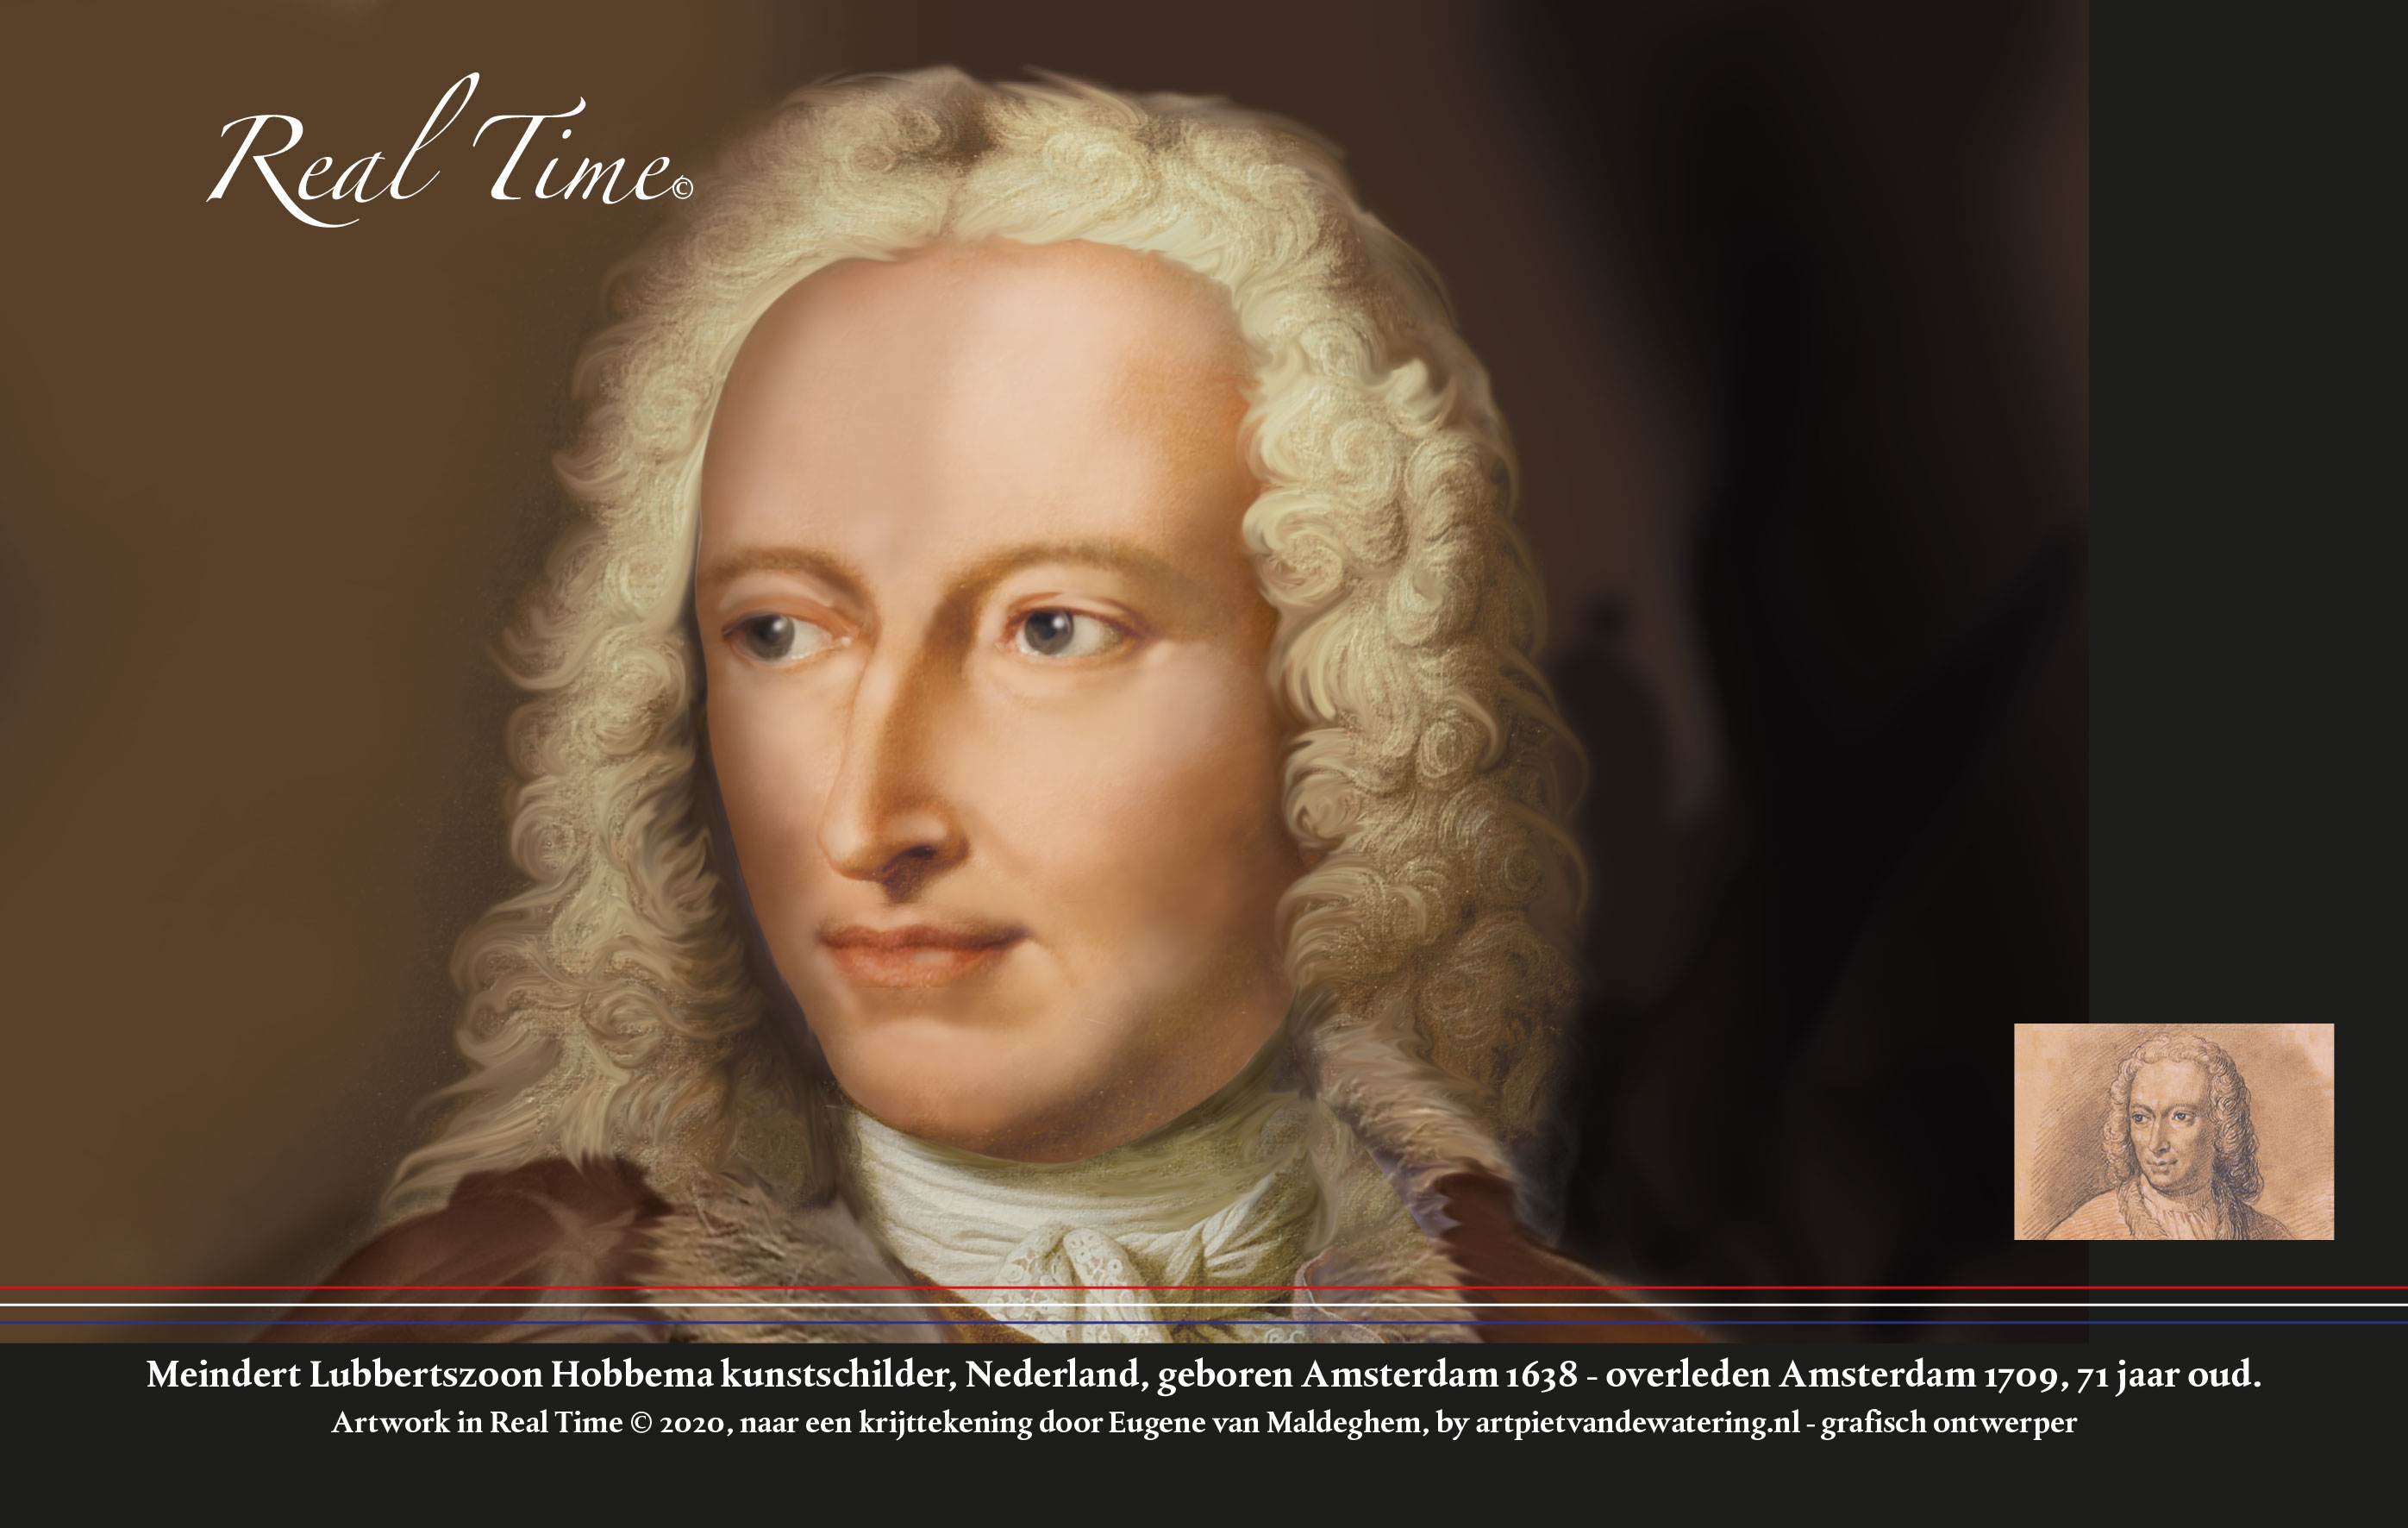 Meindert-L-Hobbema-1638-1709